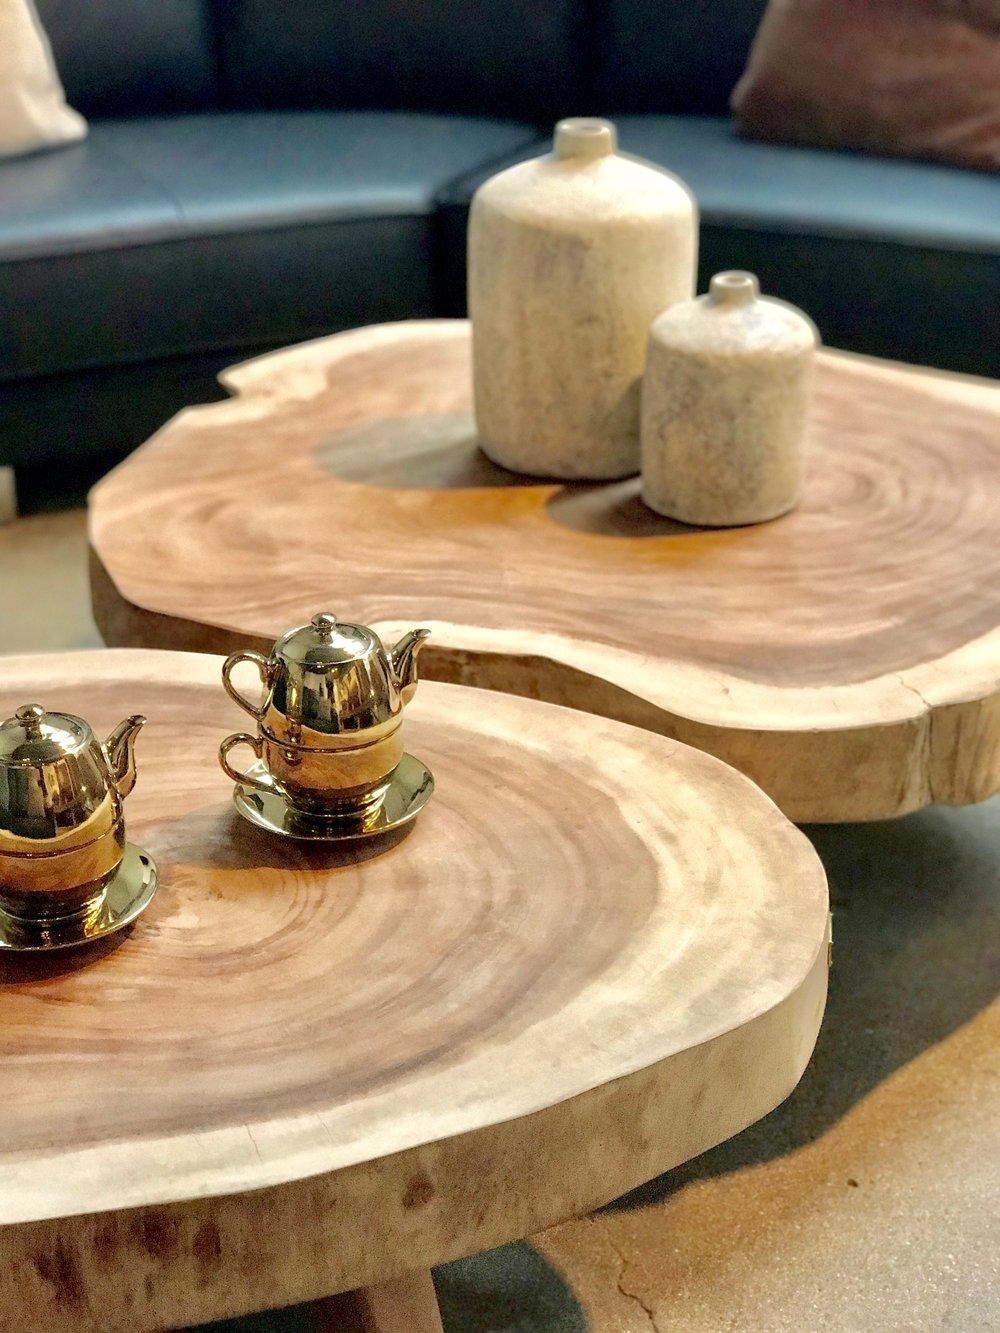 coffee tables. live edge single slab slice wood coffee tabesBlue Moon Furniture Store, Winnipeg, Manitoba, Canada. Modern, Contemporary cool luxury furniture. Local design.jpg